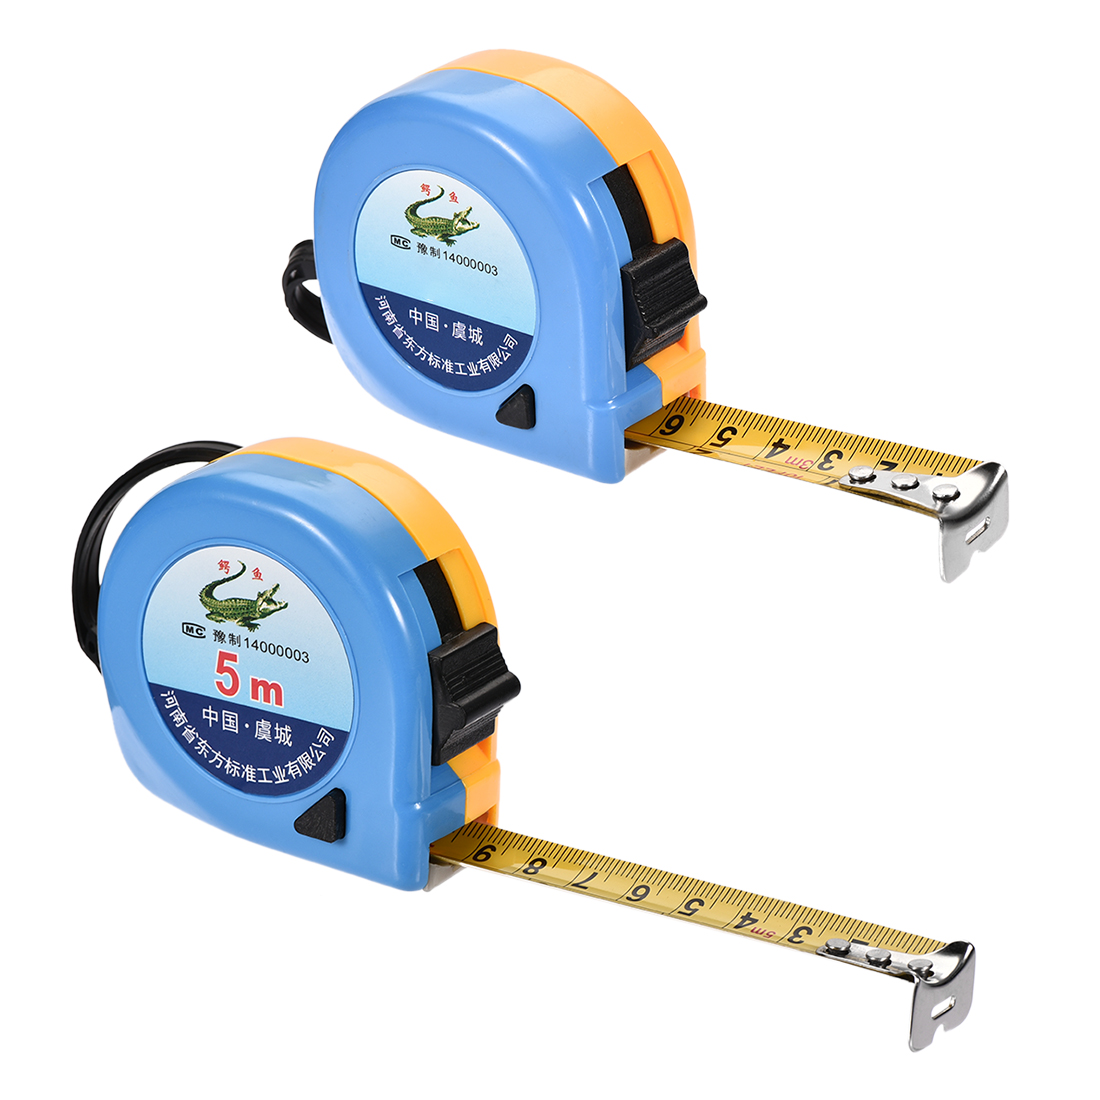 Tape Measure 3-5 Meter 10-16 Feet Retractable Metric Round Case 2 in 1 Set